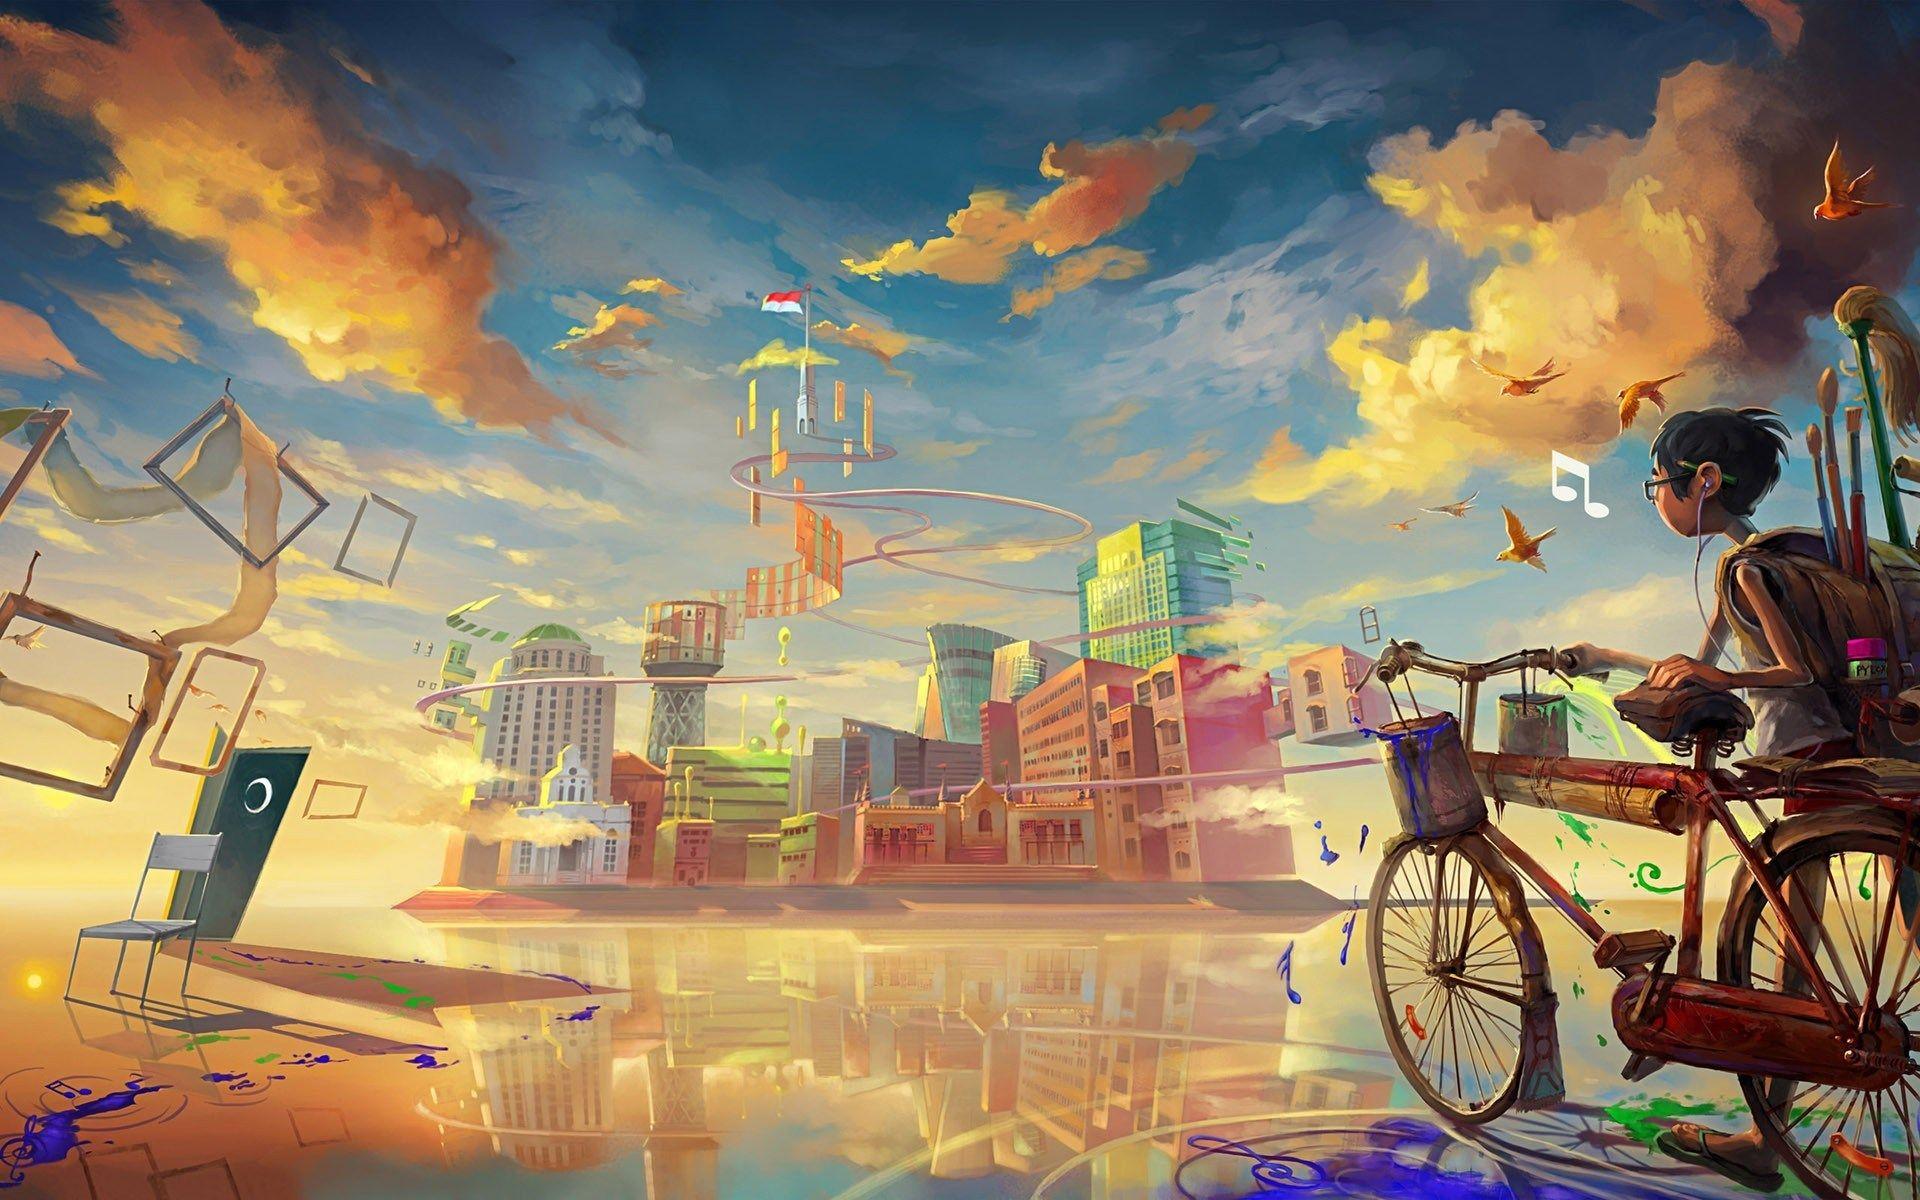 Breathtaking drawing boy bicycle fantasy city music paint art hd breathtaking drawing boy bicycle fantasy city music paint art hd wallpaper 1920x1200px stopboris Image collections